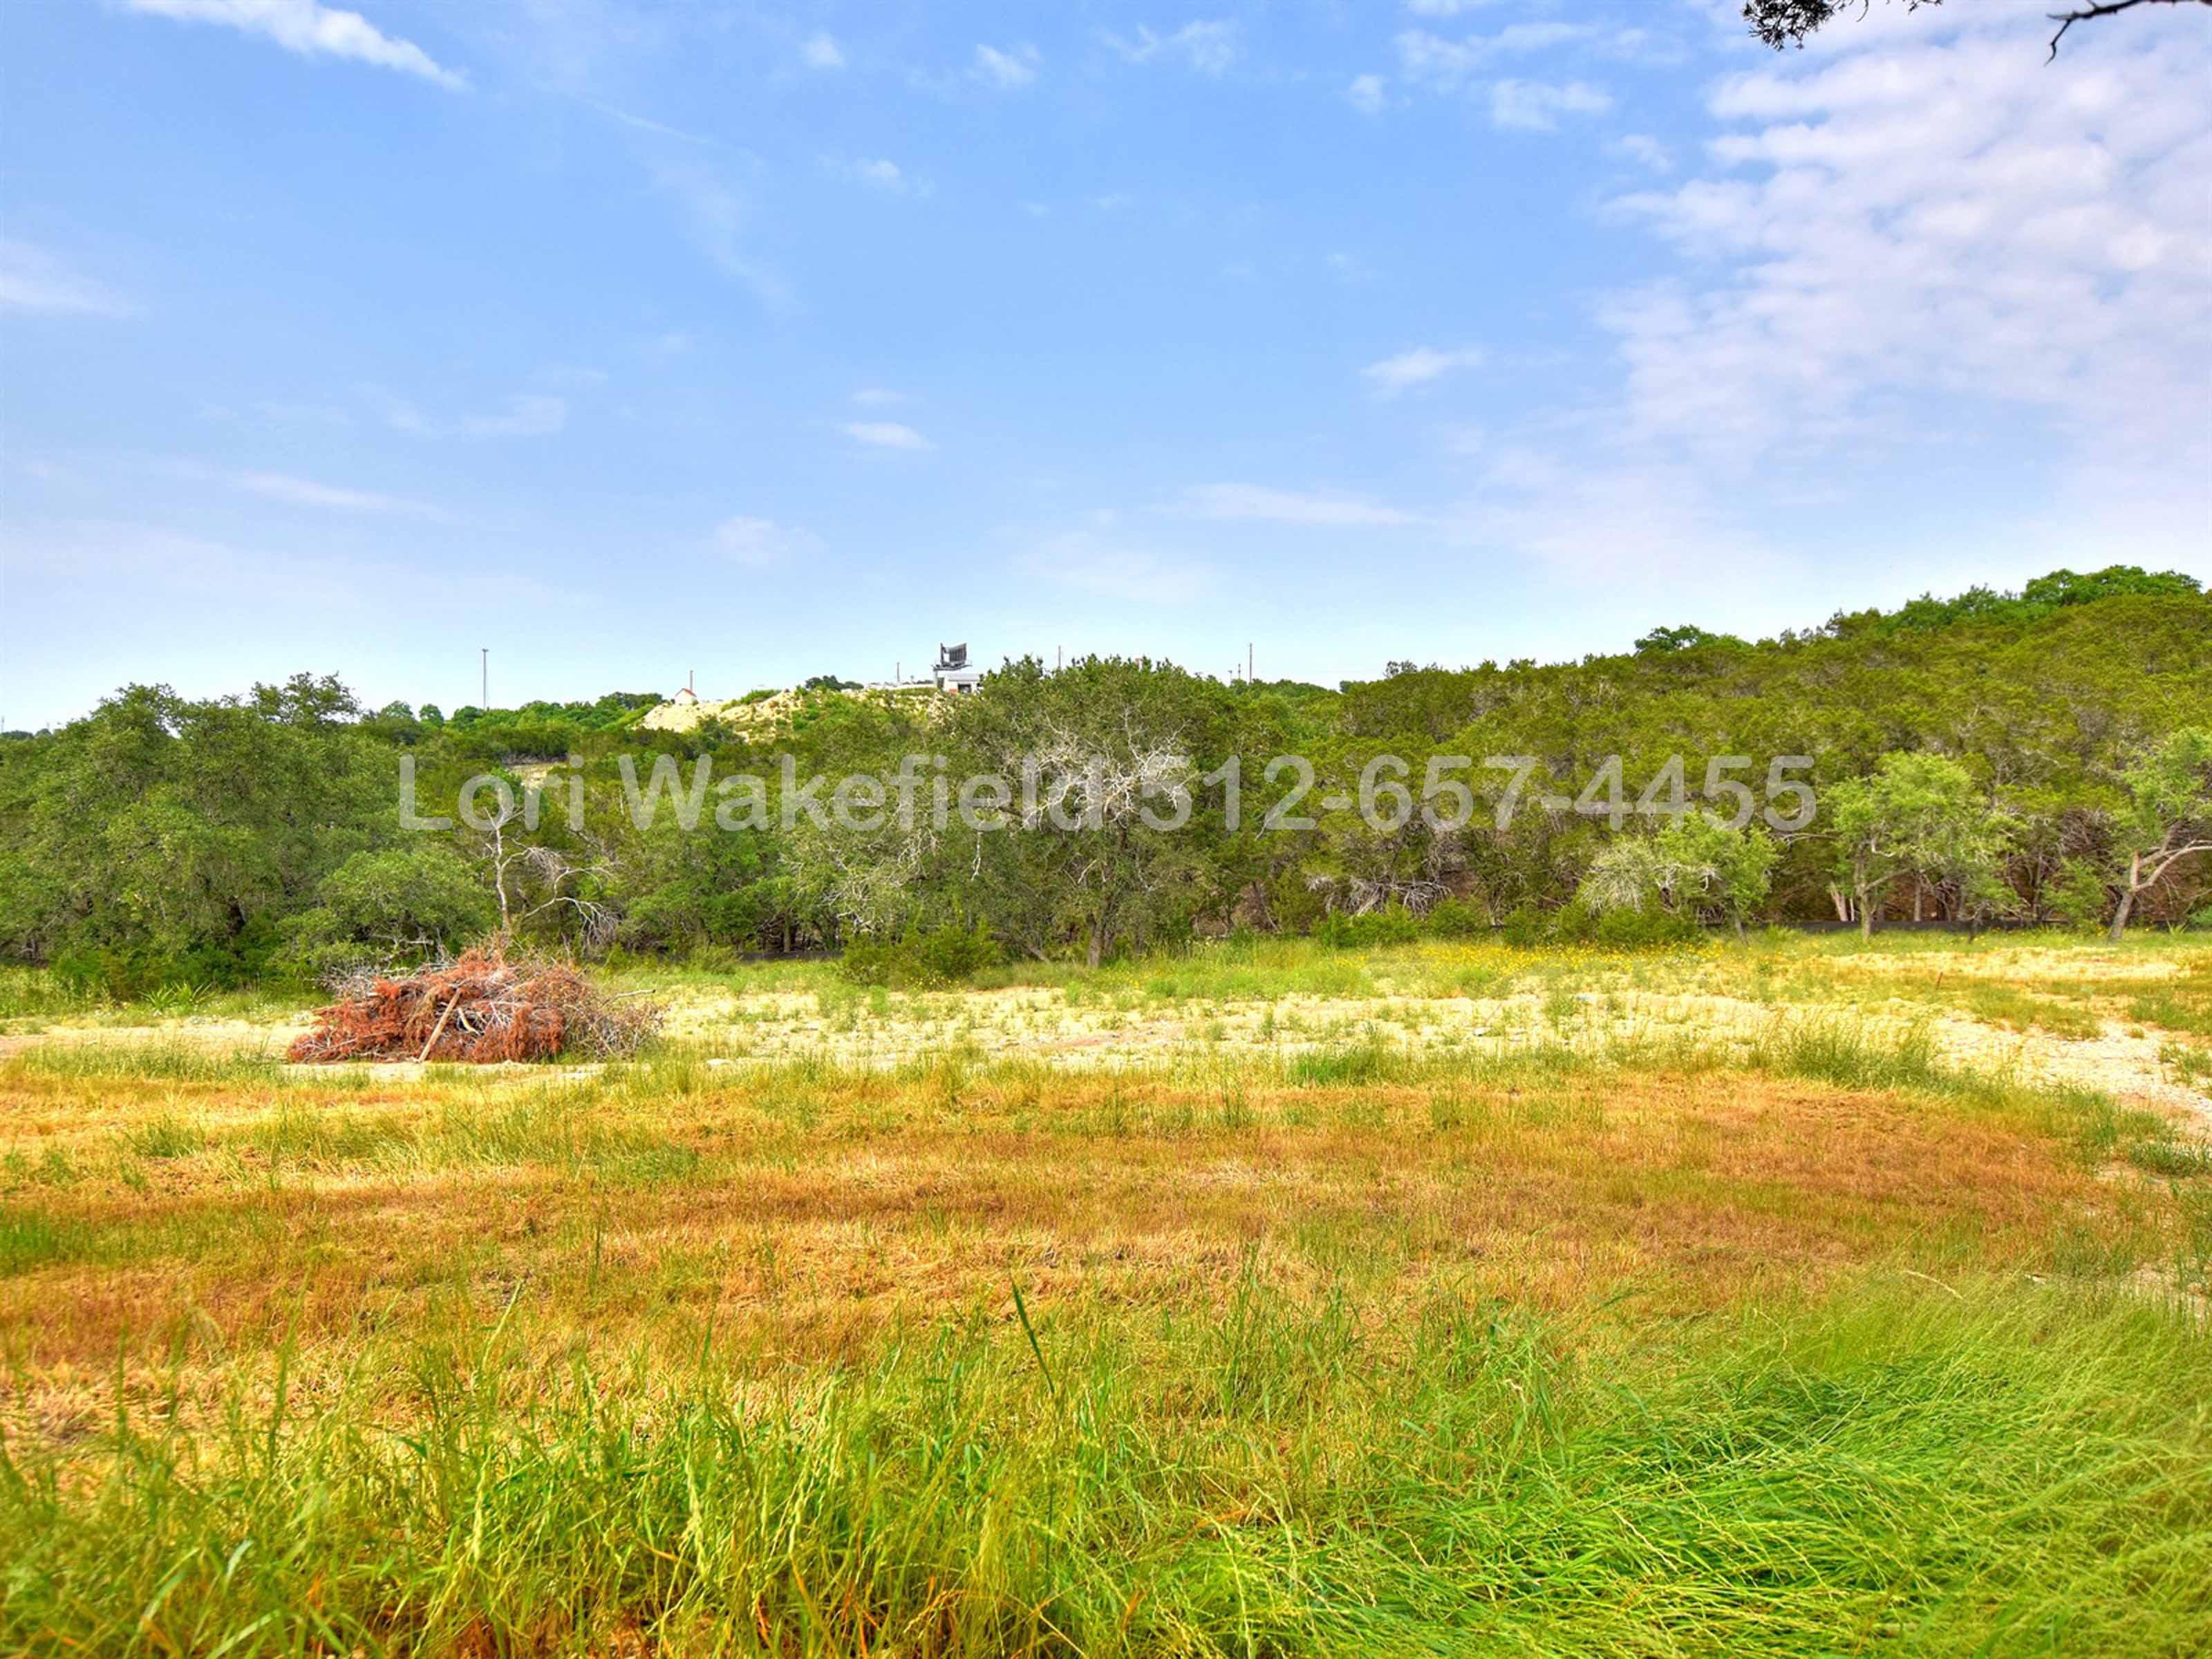 5421 Diamante Dr | Home for Sale in Lake Travis ISD | www.AustinRealEstateGroup.com | Keller Williams Lake Travis